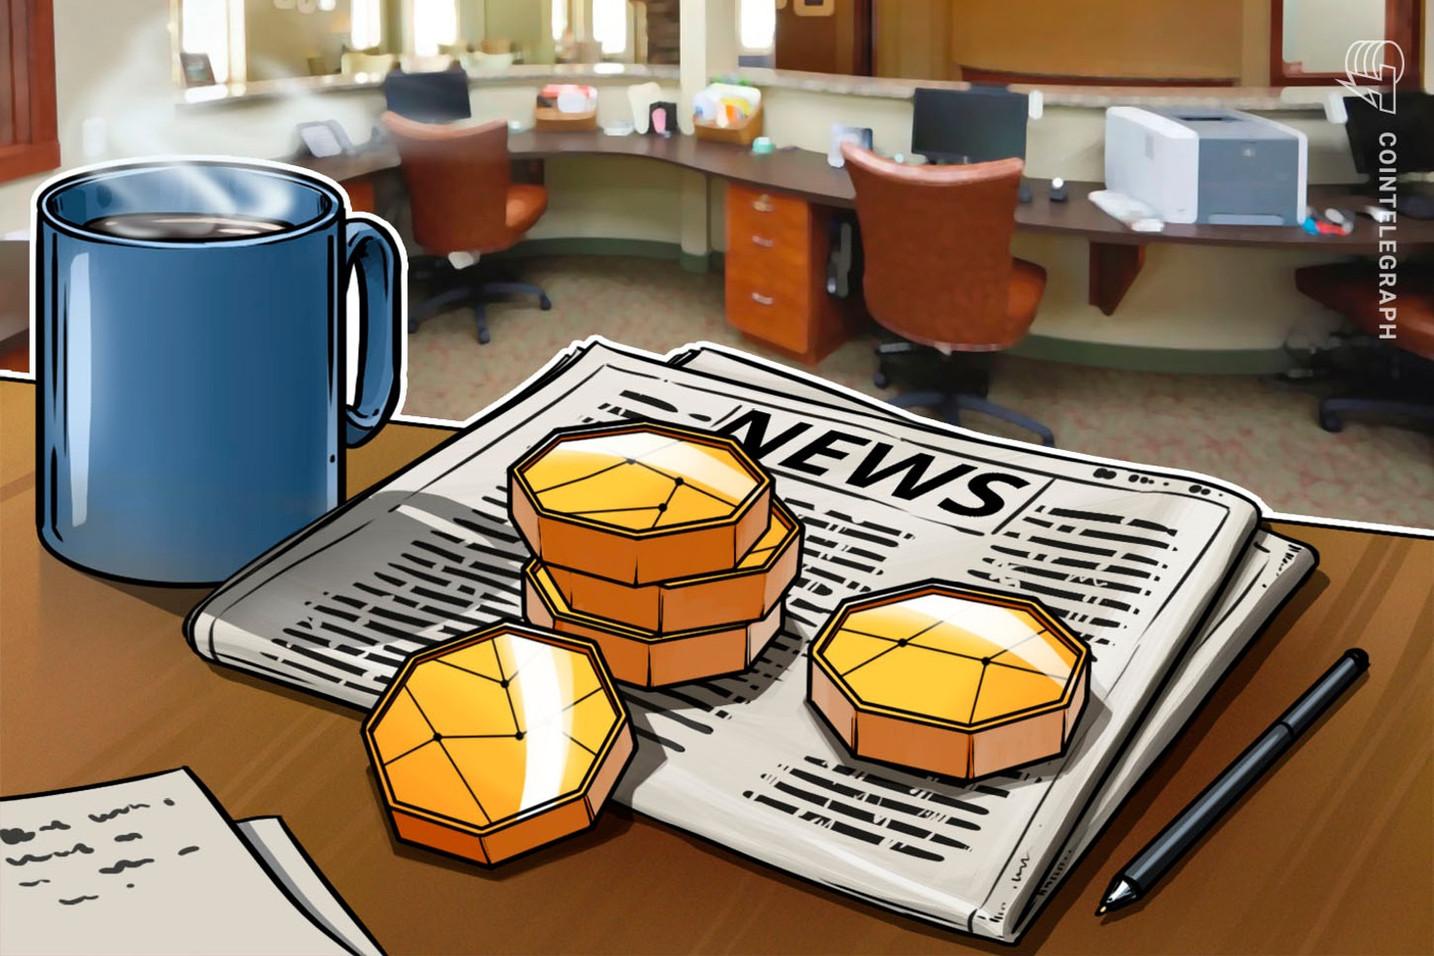 LINEの海外仮想通貨取引所BITBOXでXRPが上場廃止か【ニュース】